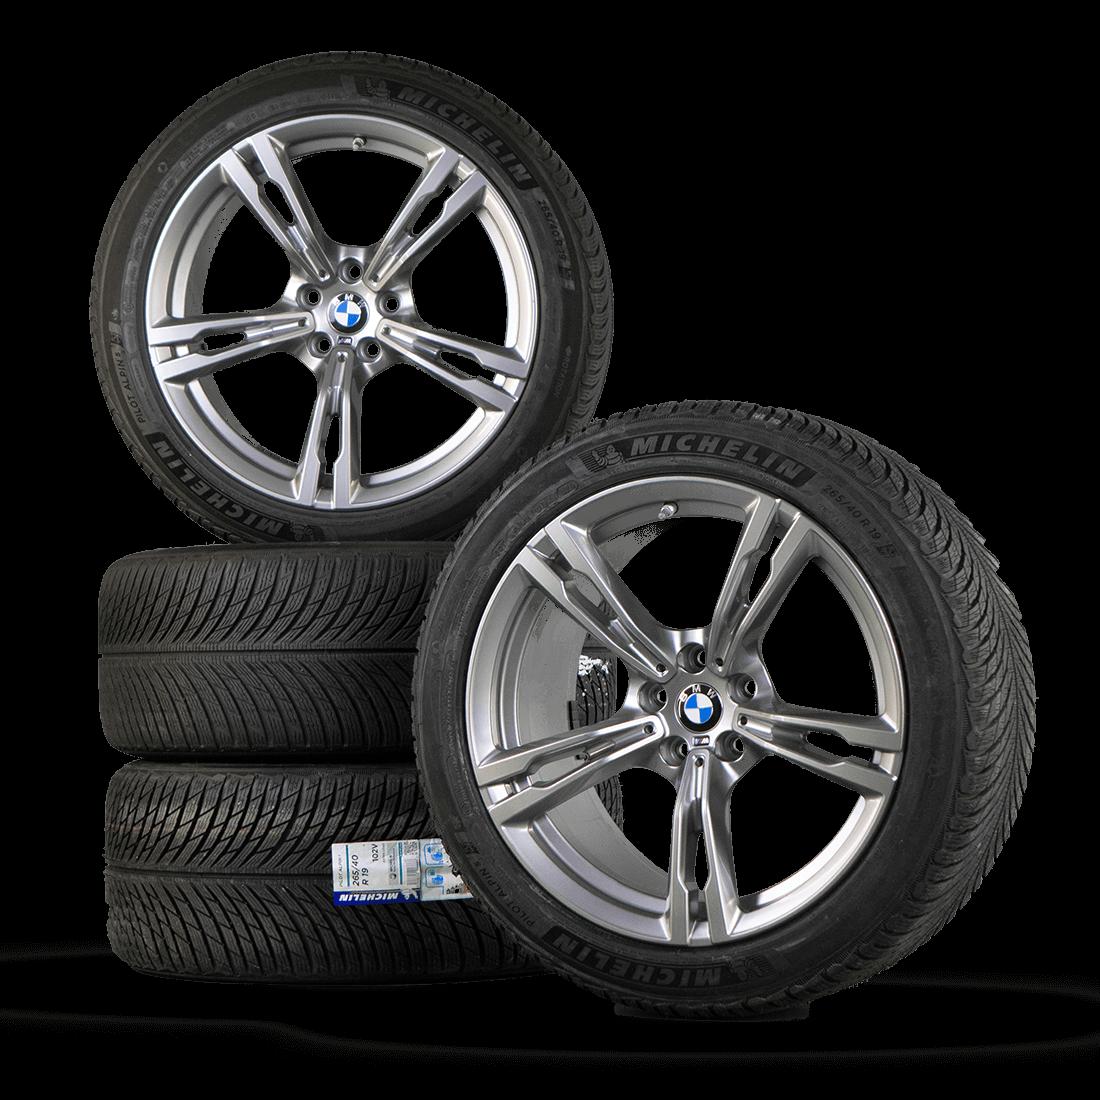 Bmw 19 Inch Rims M5 F90 Alloy Rims Winter Tires Winter Wheels